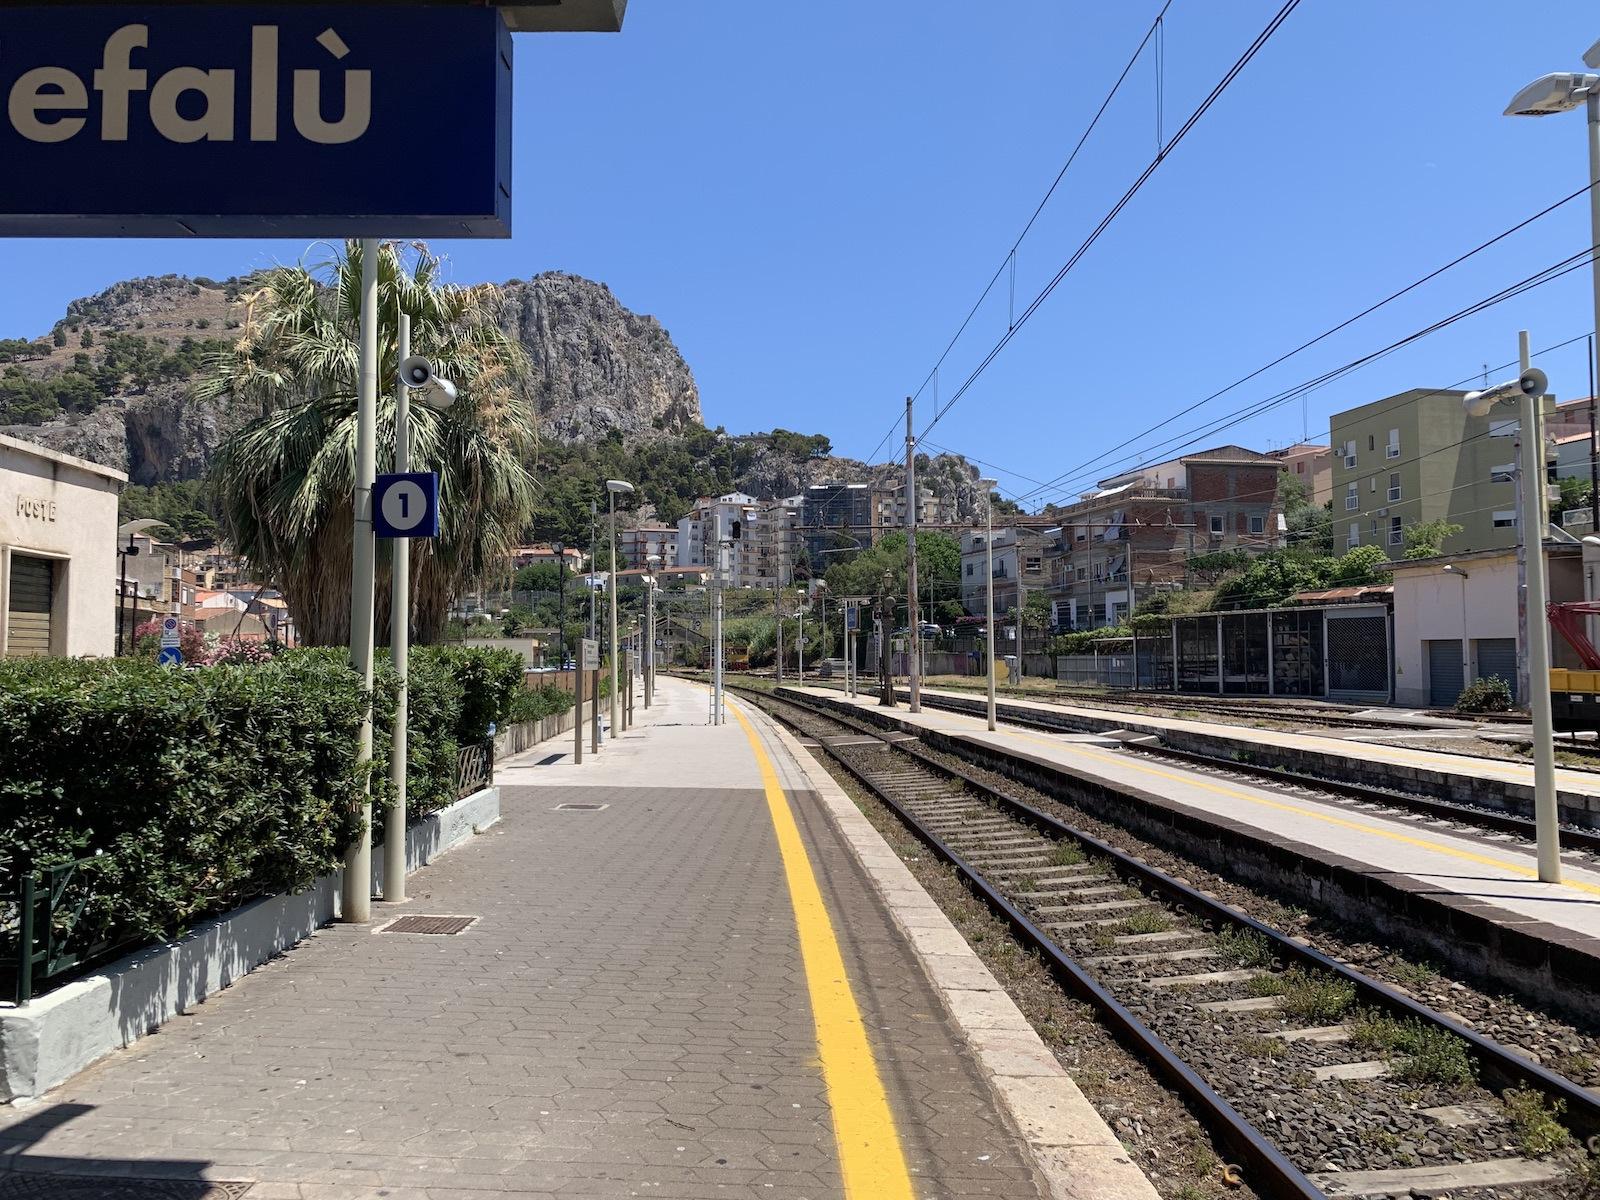 Cefalú vasútállomás